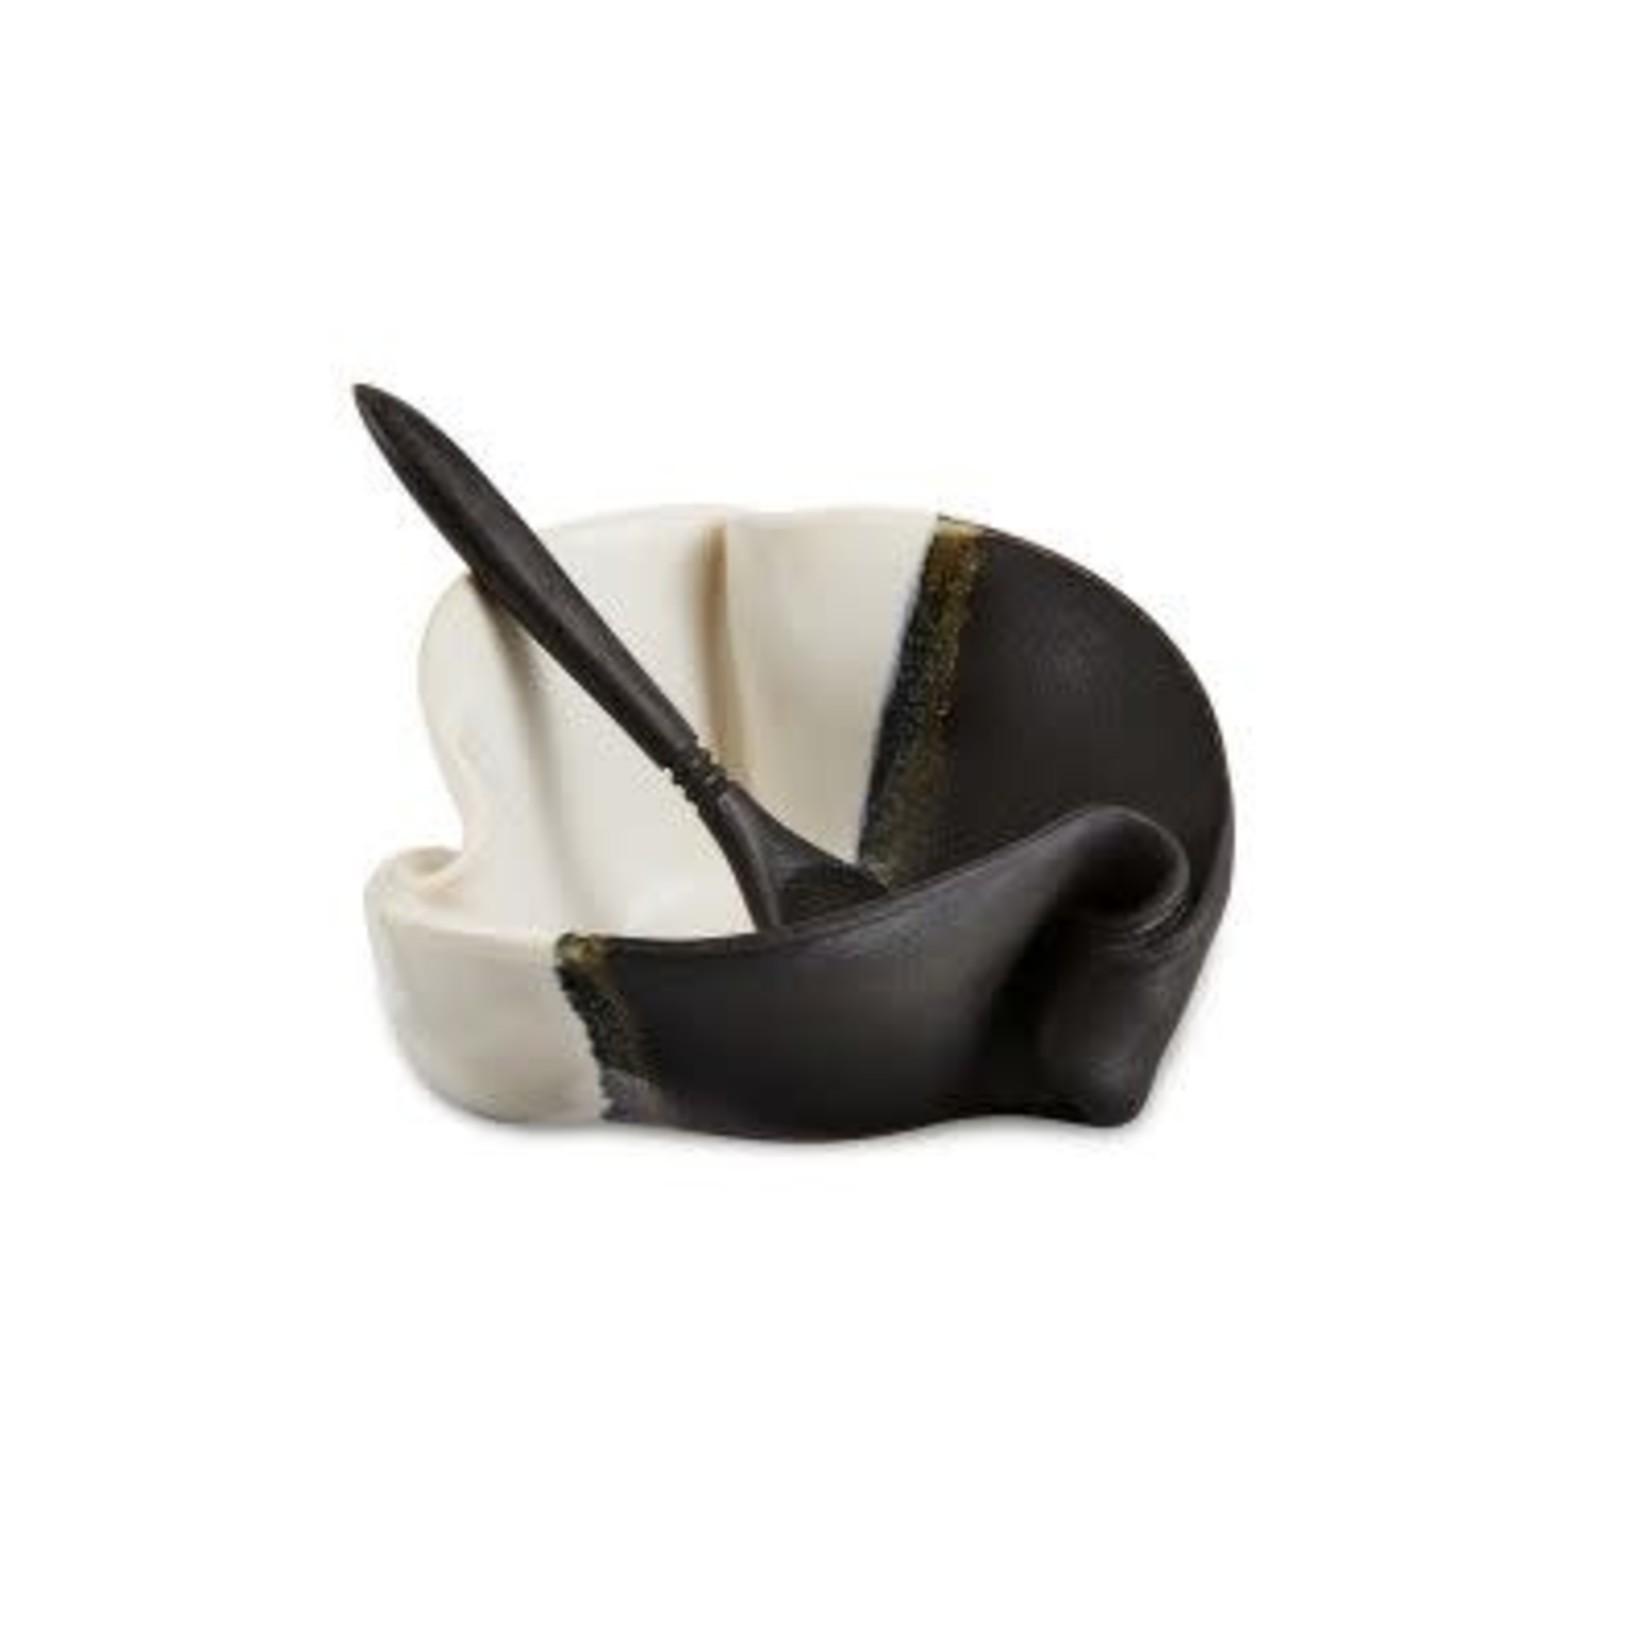 Hilborn Pottery Design Mustard Pot